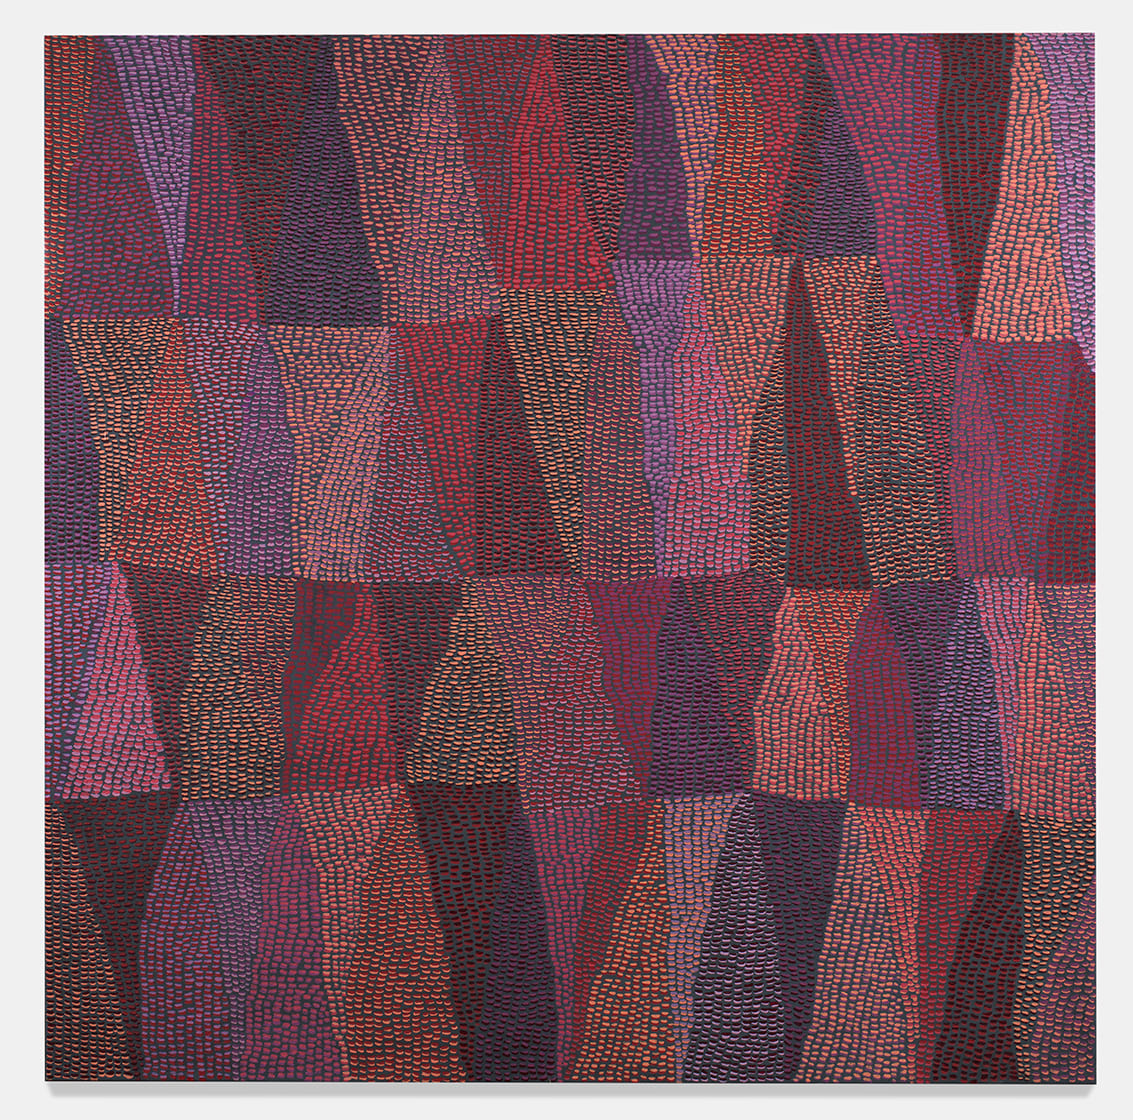 Madeleine Keesing, Untitled, 2014-2015